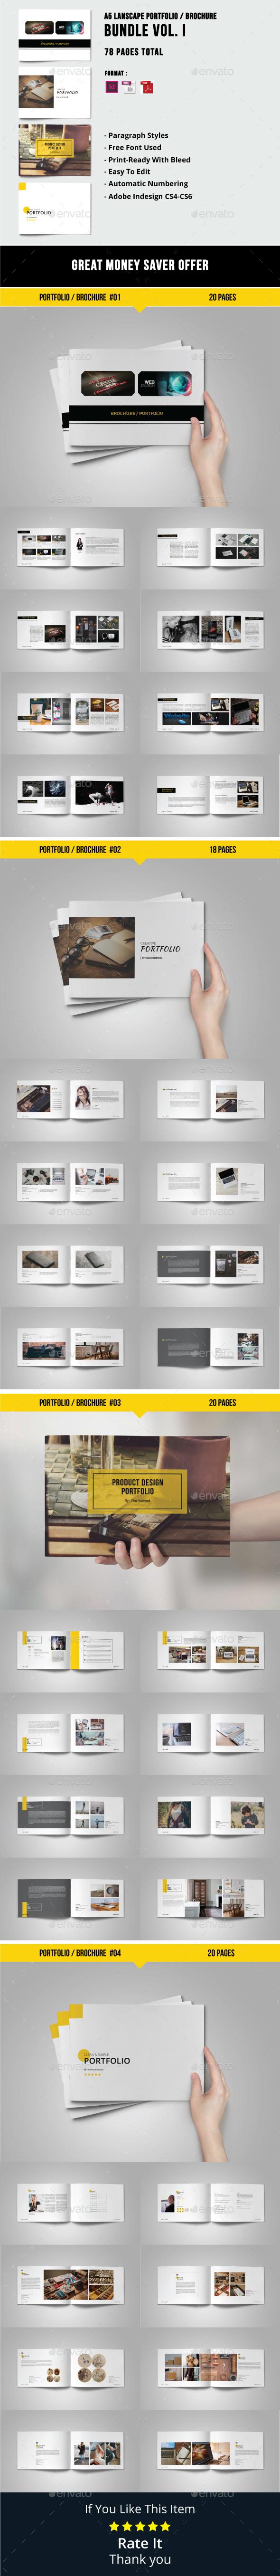 A5 Lanscape Portfolio / Brochure Bundle - Portfolio Brochures